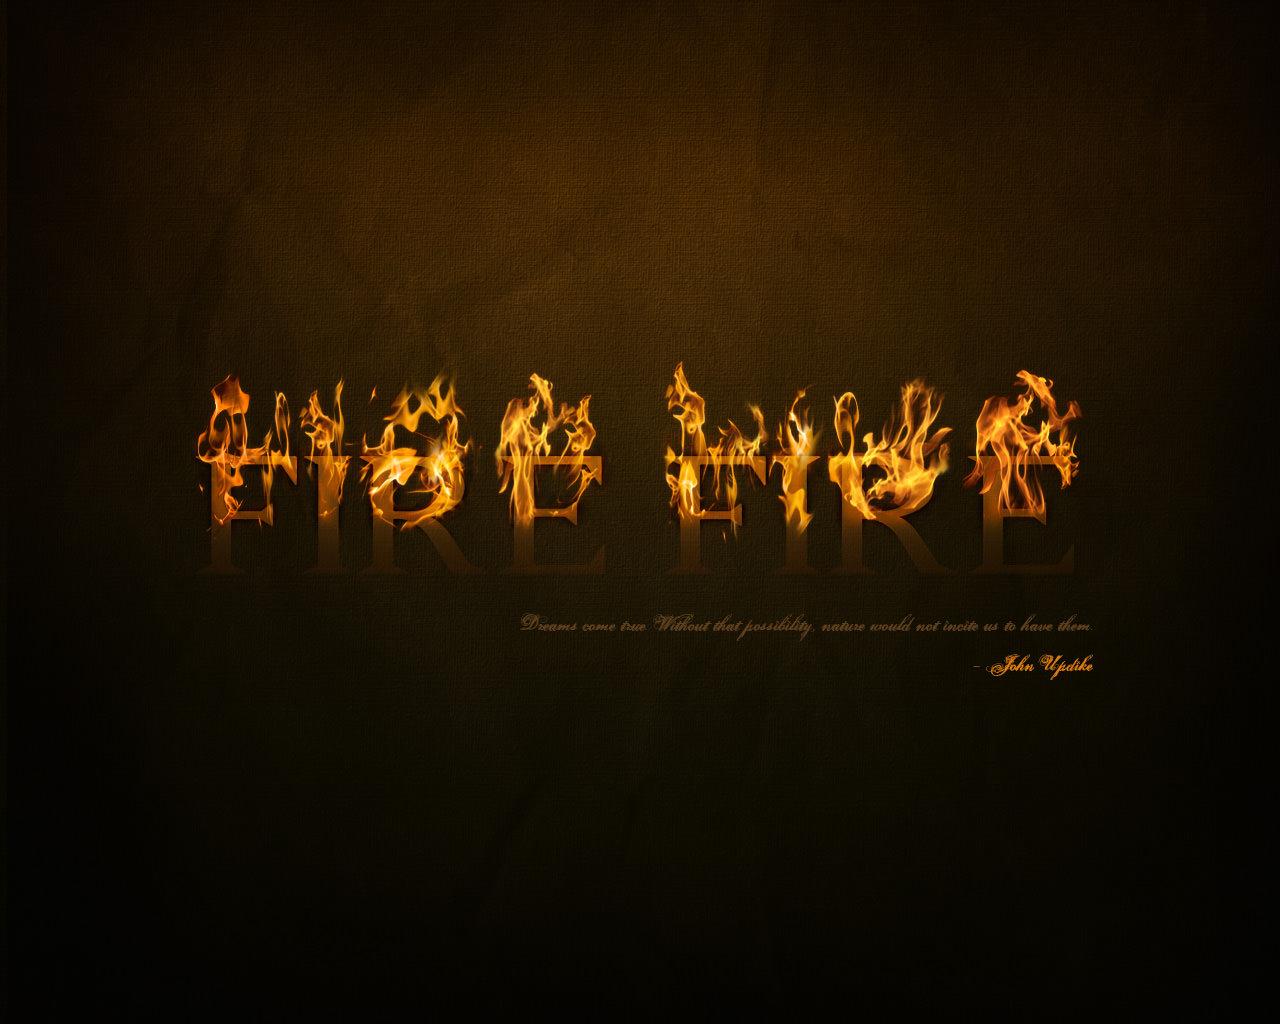 firetextreal.jpg